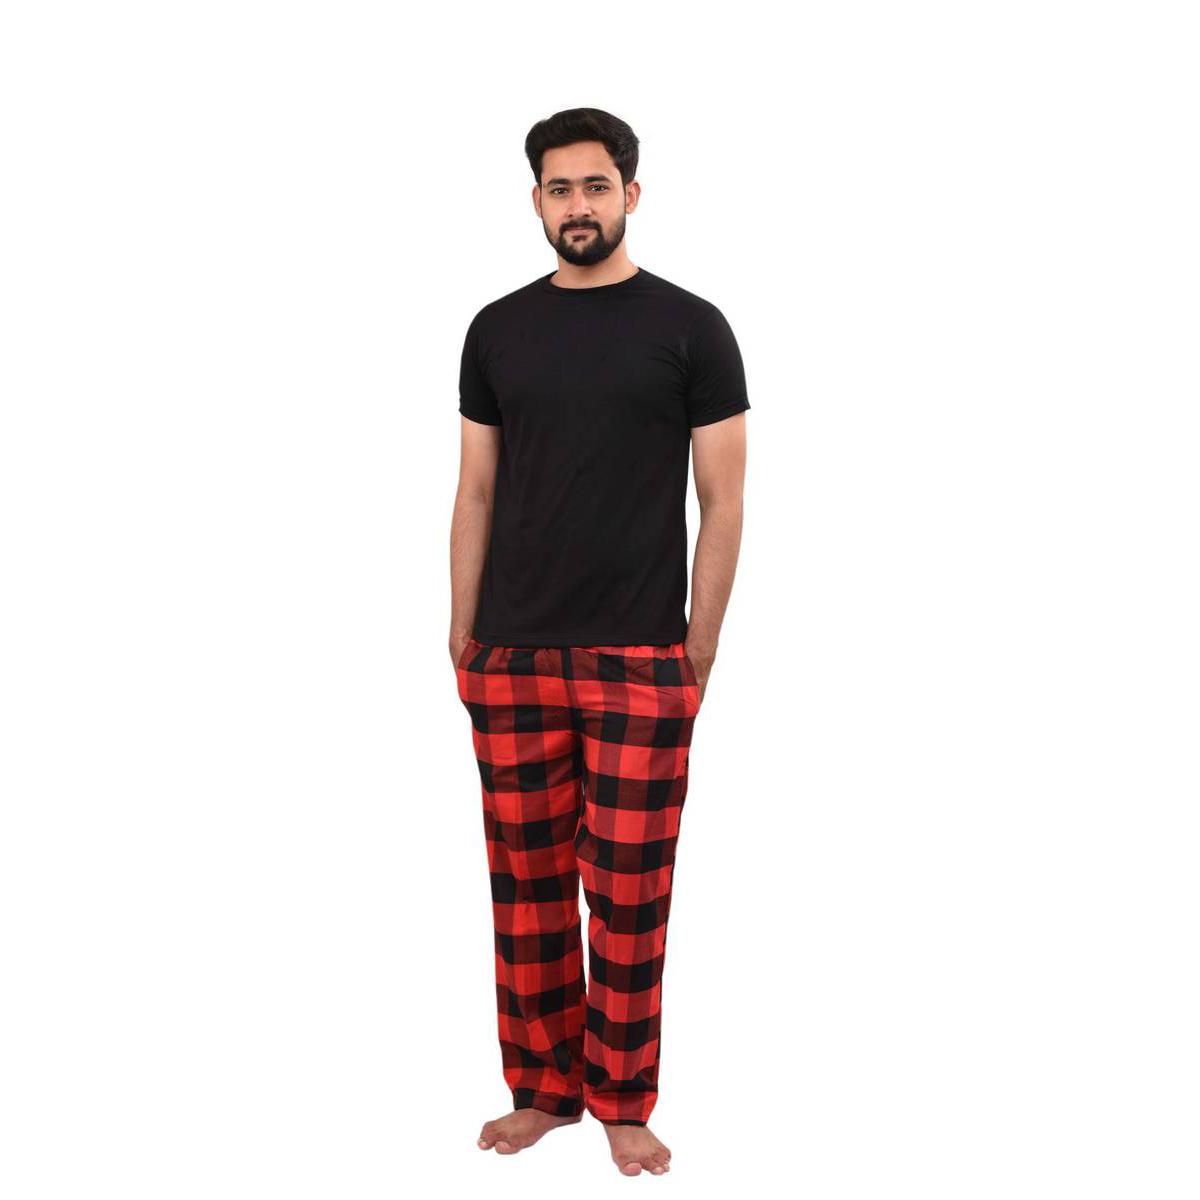 Men's New Pyjamas Set, Checked Pyjamas for Men, Men's Pj's Cotton Short Sleeves Round Neck T-Shirts, Woven Men's Pyjamas. NEW Men's CHECK Print Pyjama Set, Lounge Wear, Short Sleeve T Shirt Top, Night Wear. ~ Black 1